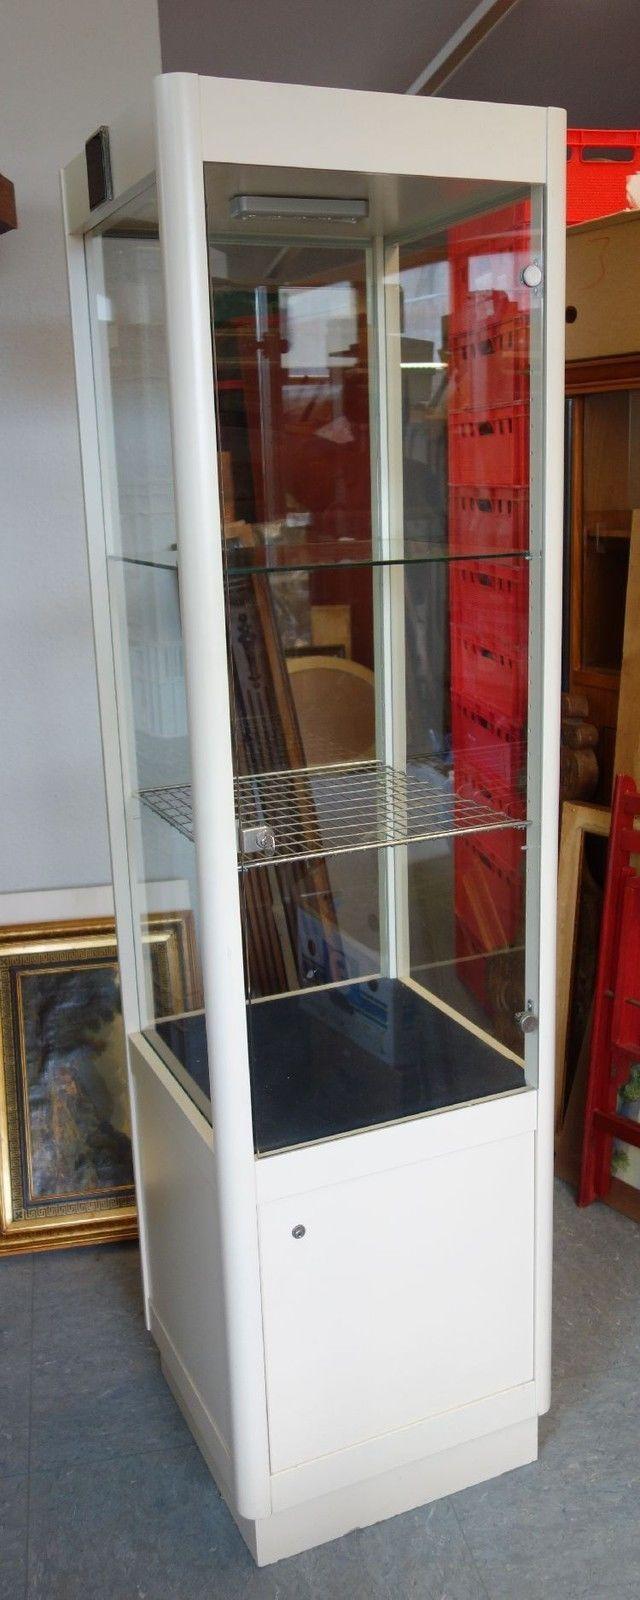 sch ne ladenvitrine schmuckvitrine glas vitrine abschlie bar sammlervitrine ebay work. Black Bedroom Furniture Sets. Home Design Ideas